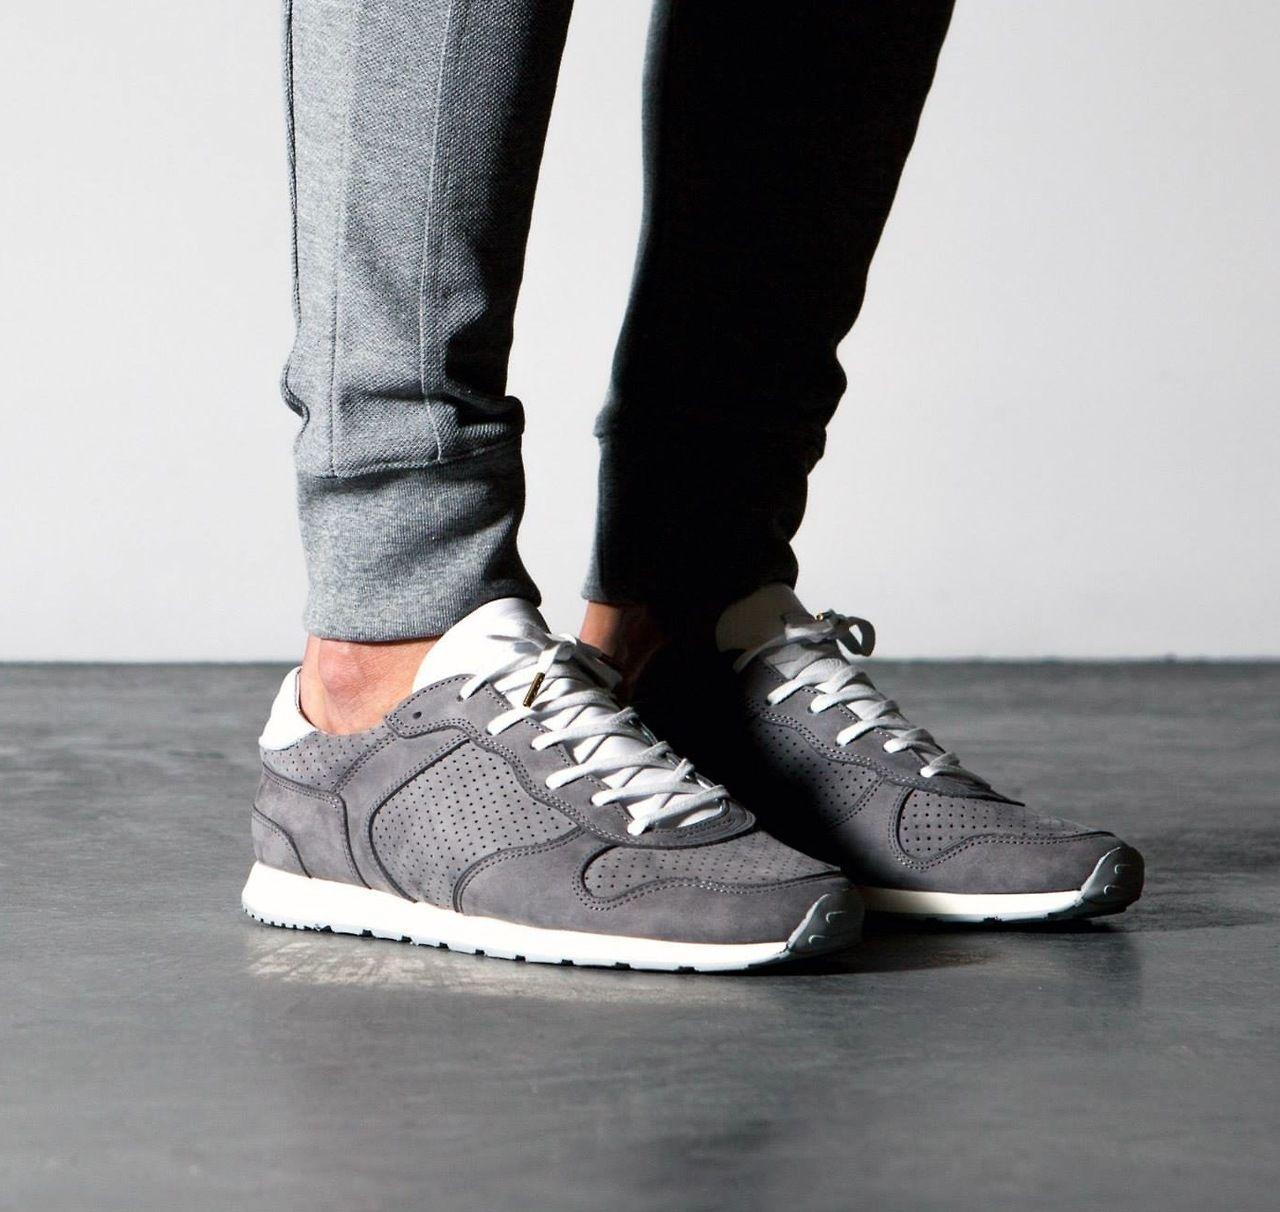 timeless design 3b5a7 5fbe7 sneakers forever Sandalias, Zapatos, Tacones, Tenis, Alpargatas, Calzas,  Zapatillas Nike